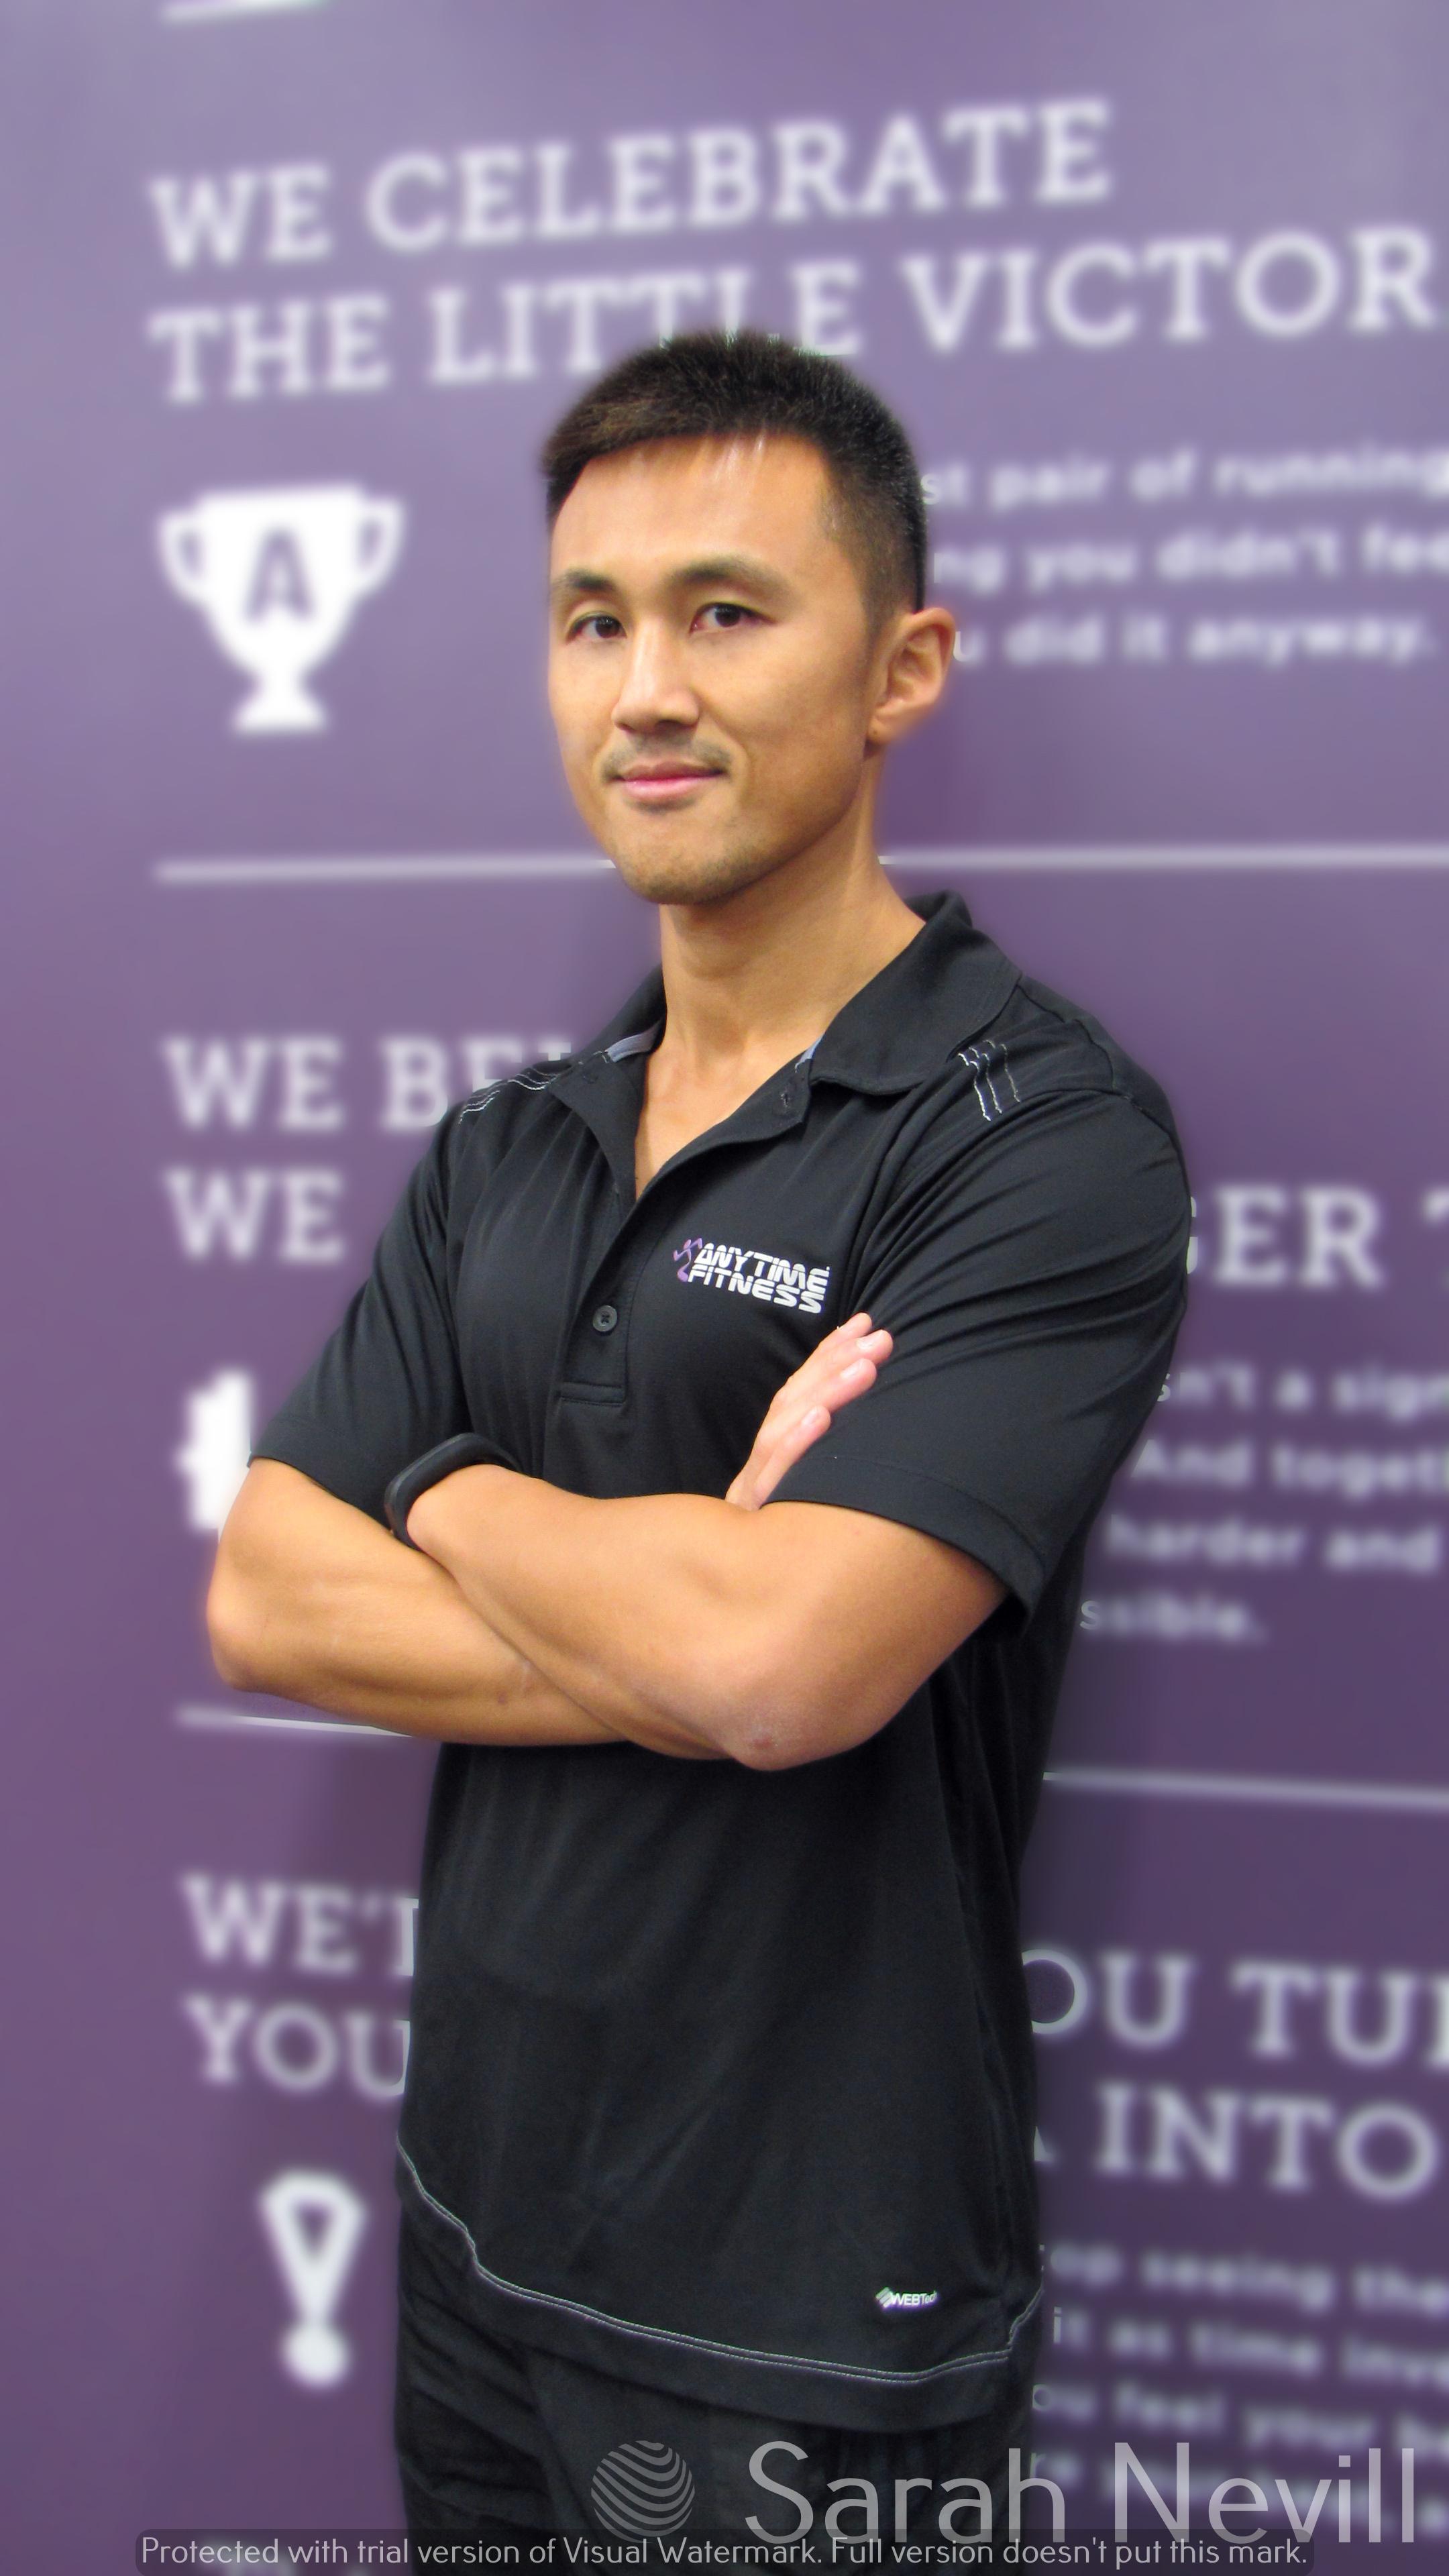 Jacob Lam